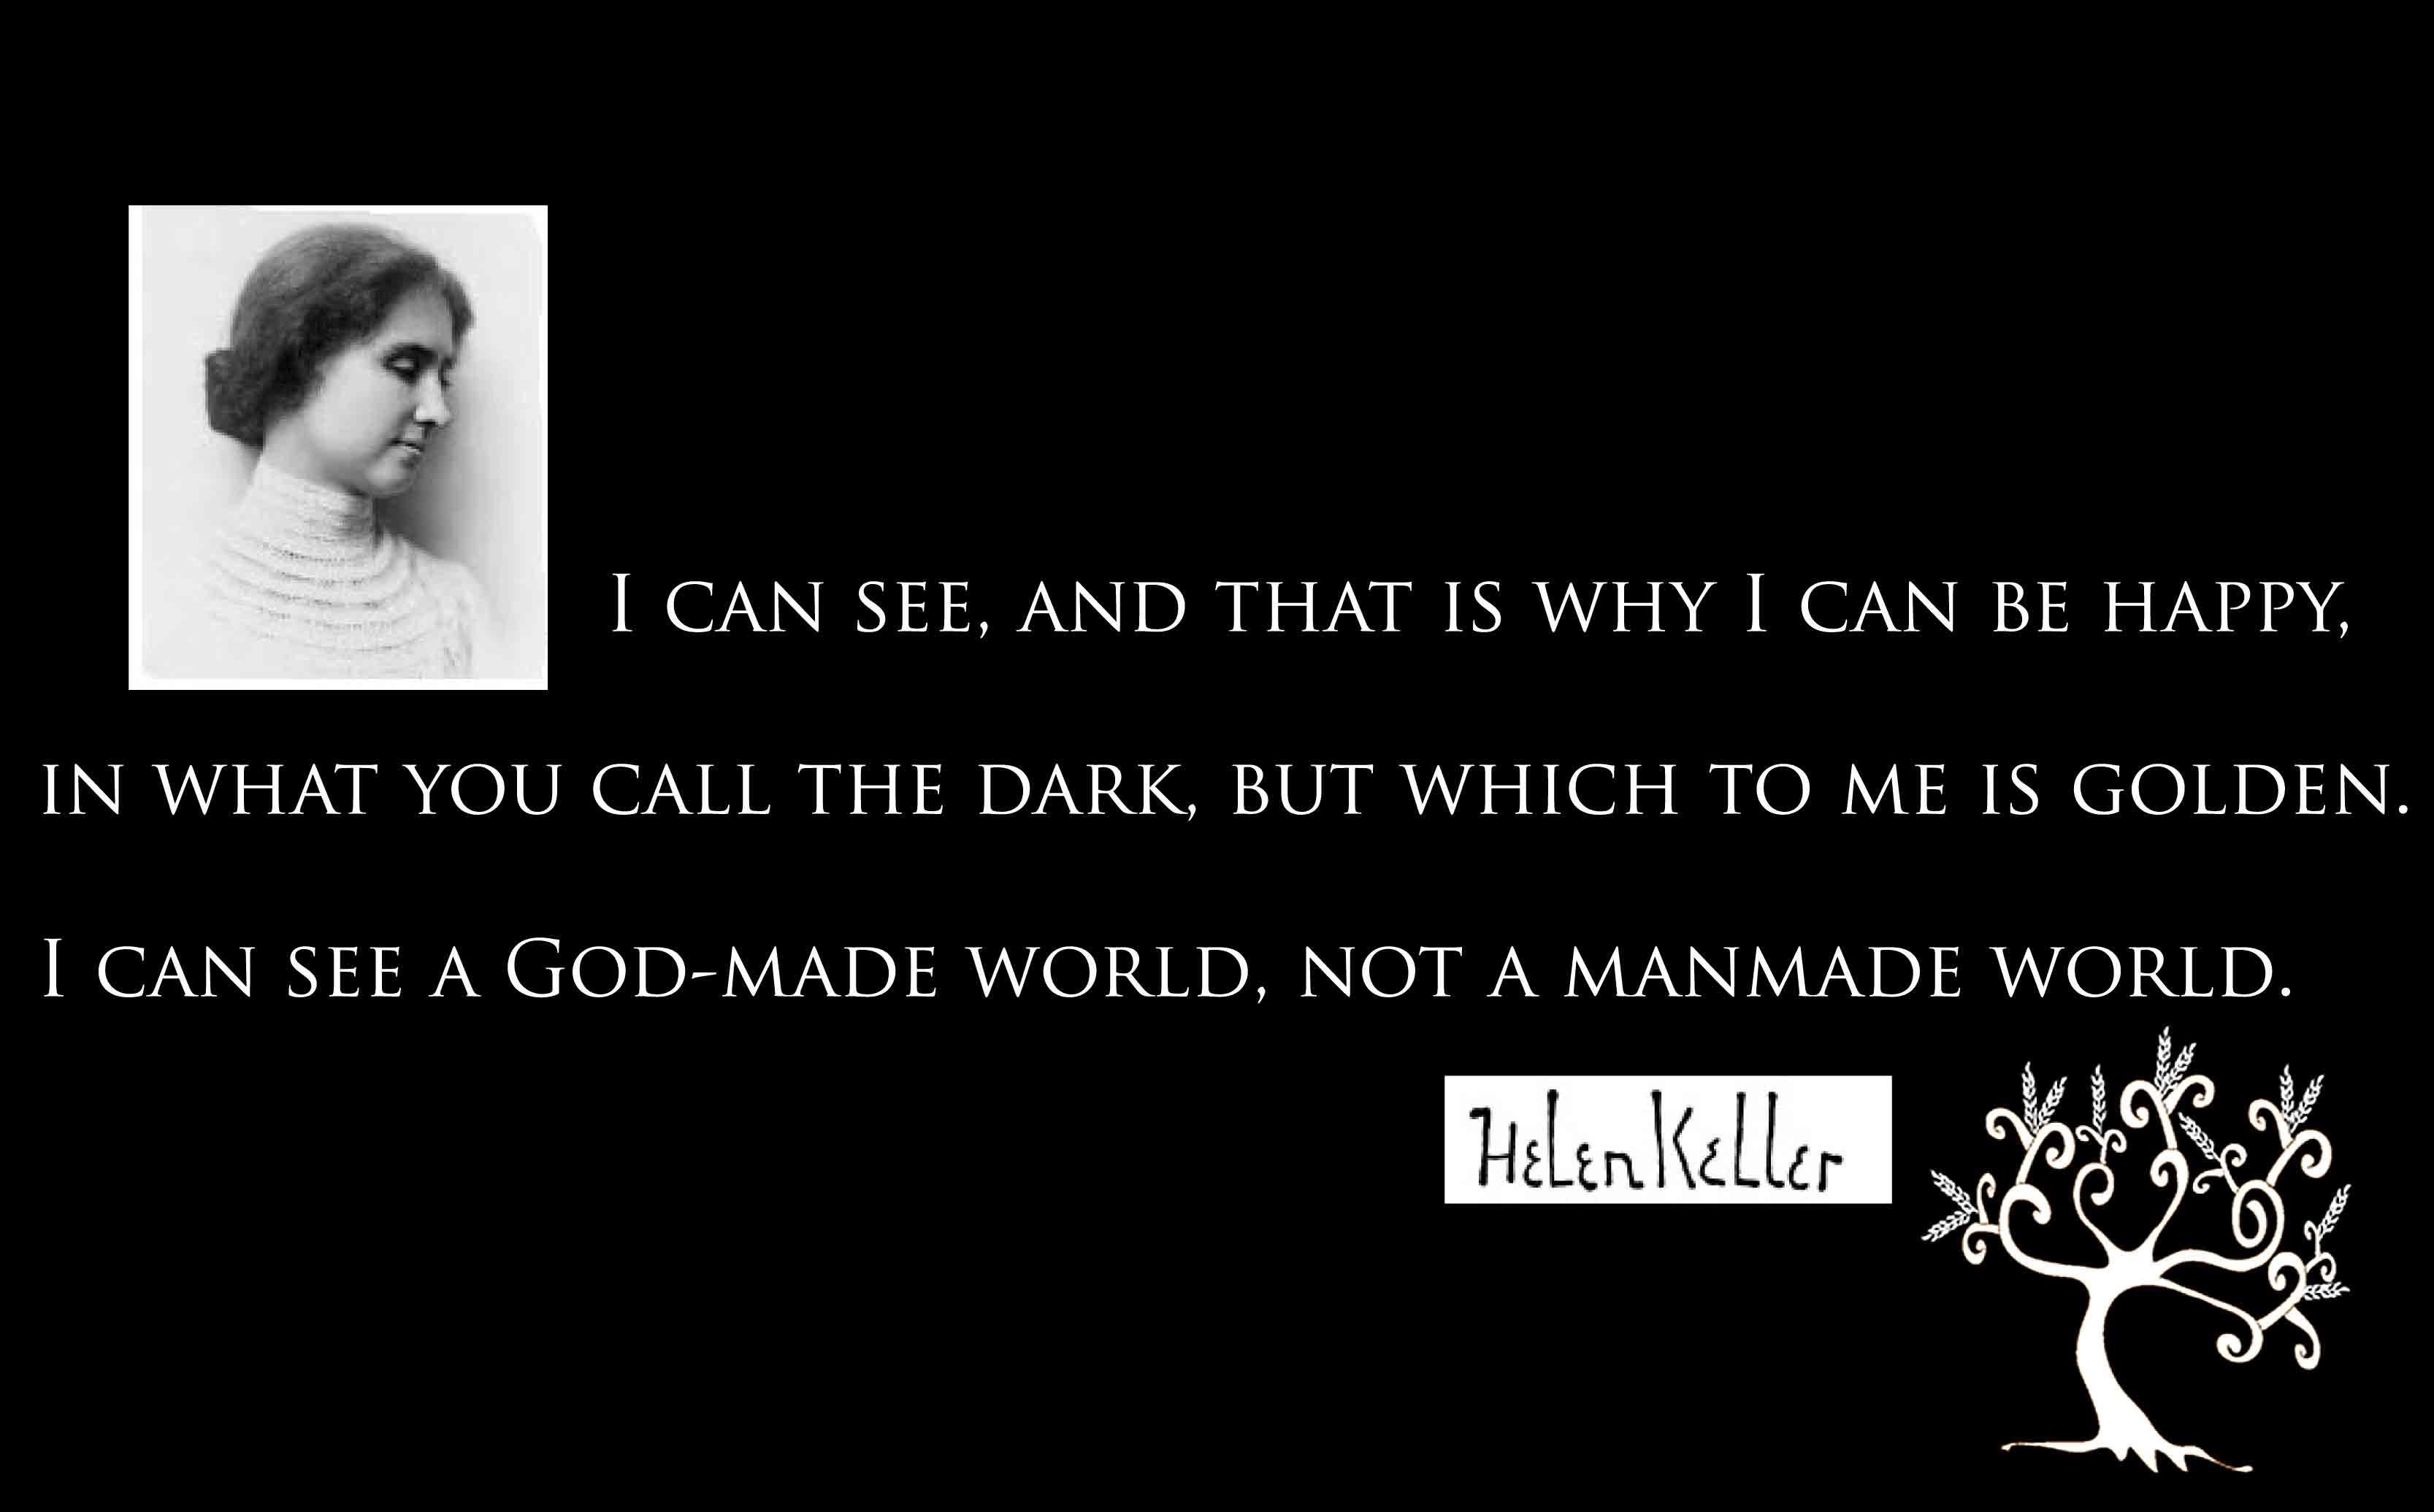 Helen Keller Funny Quotes | Helen Keller: Light in the Dark ...